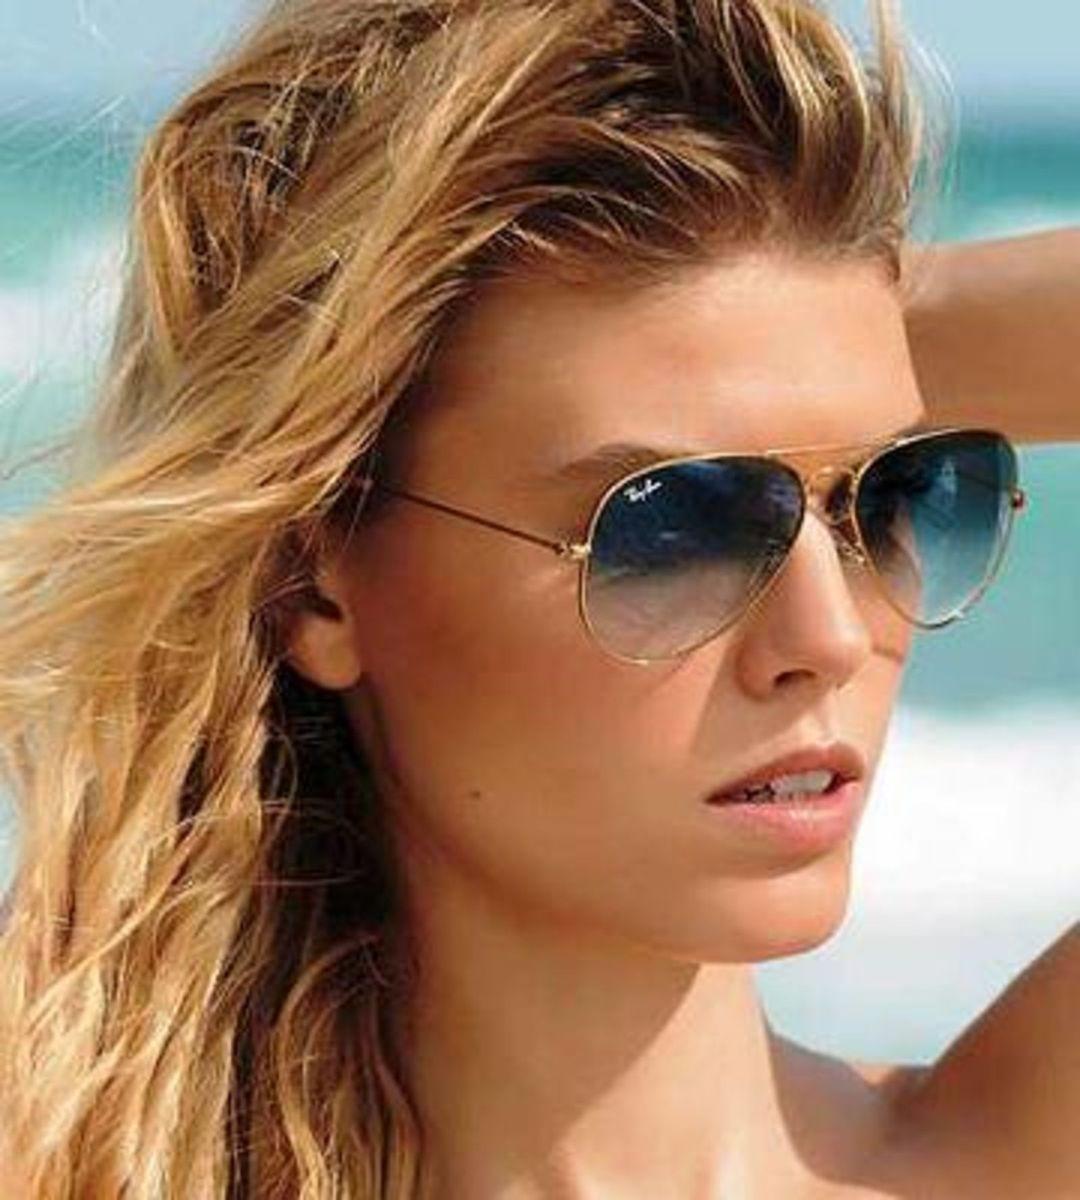 Ray Ban Aviador Azul 0rb3025 183 r5 55-14   Óculos Feminino Ray Ban ... 98c94380b9